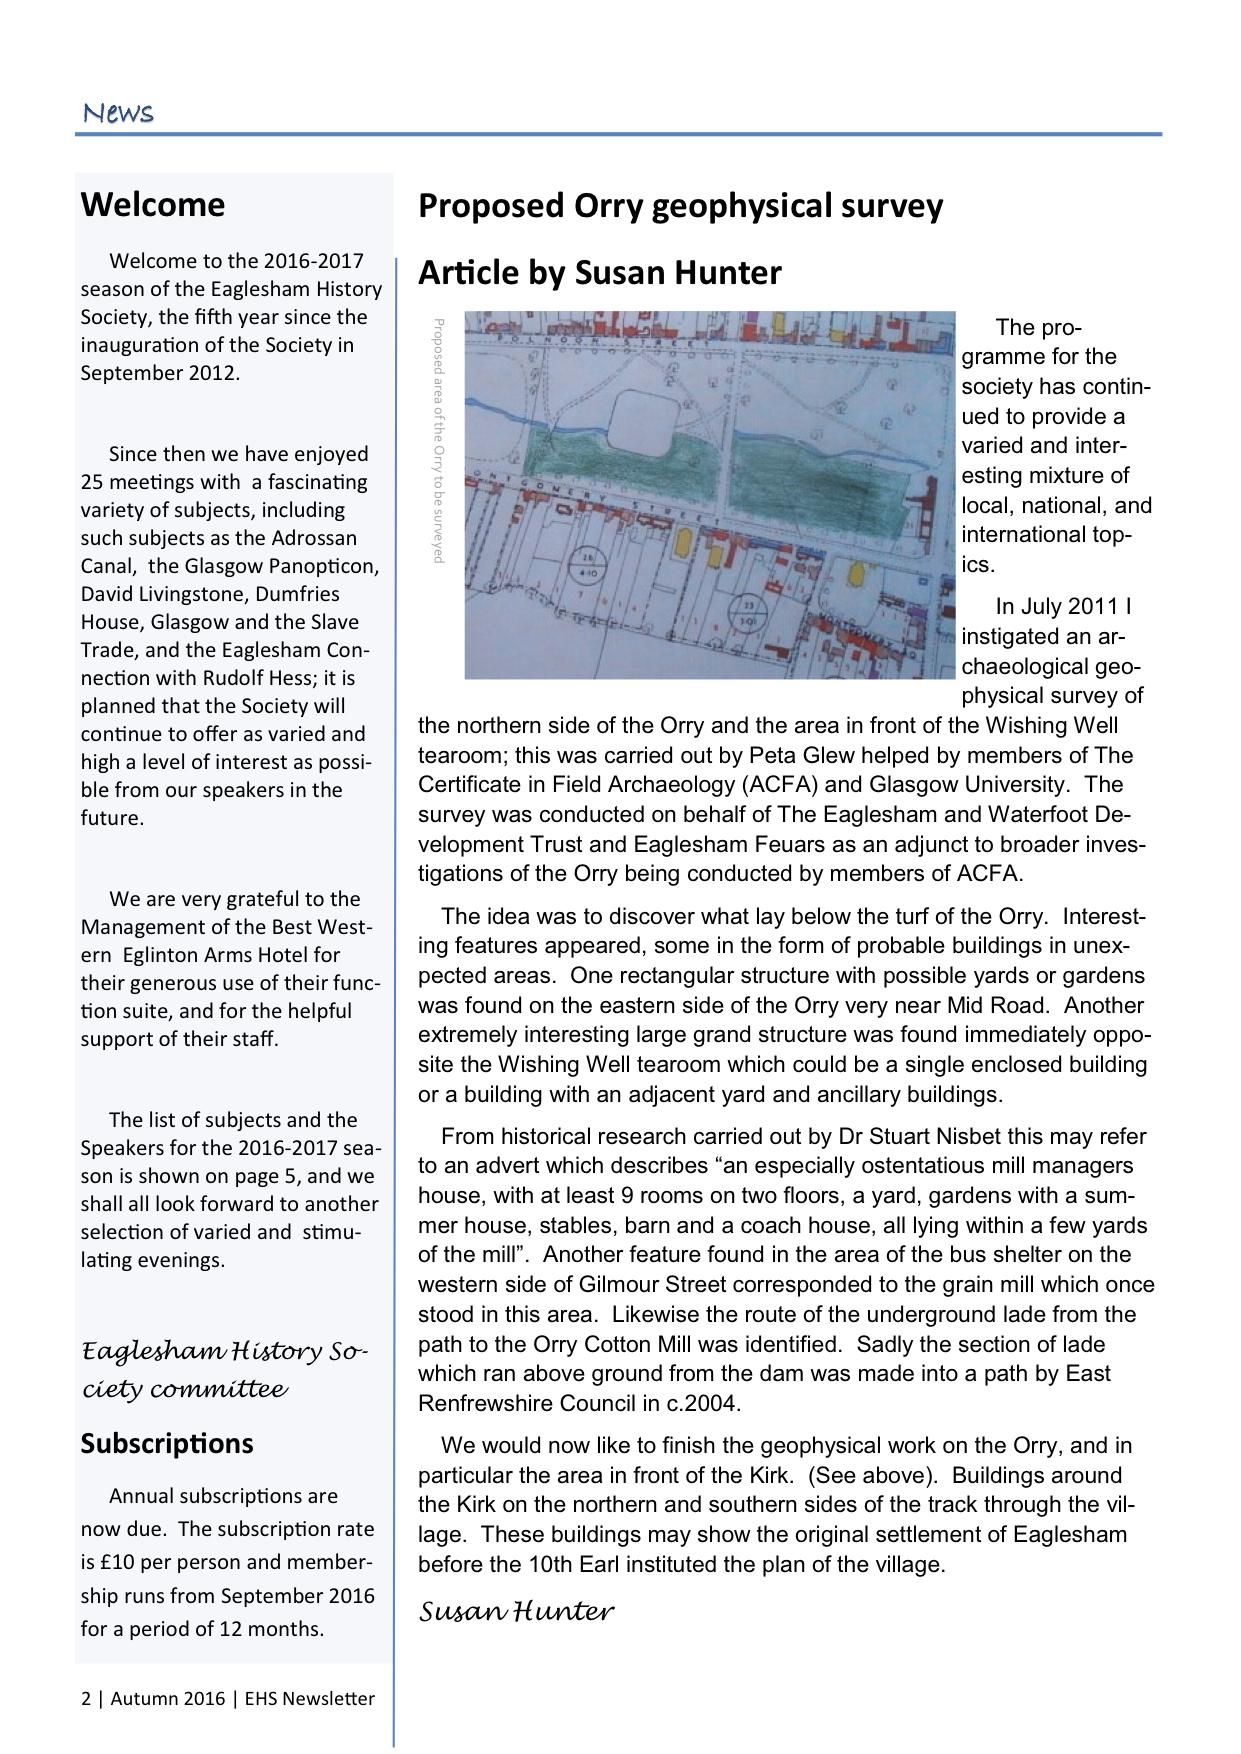 EHS Newsletter Autumn 2016 p2